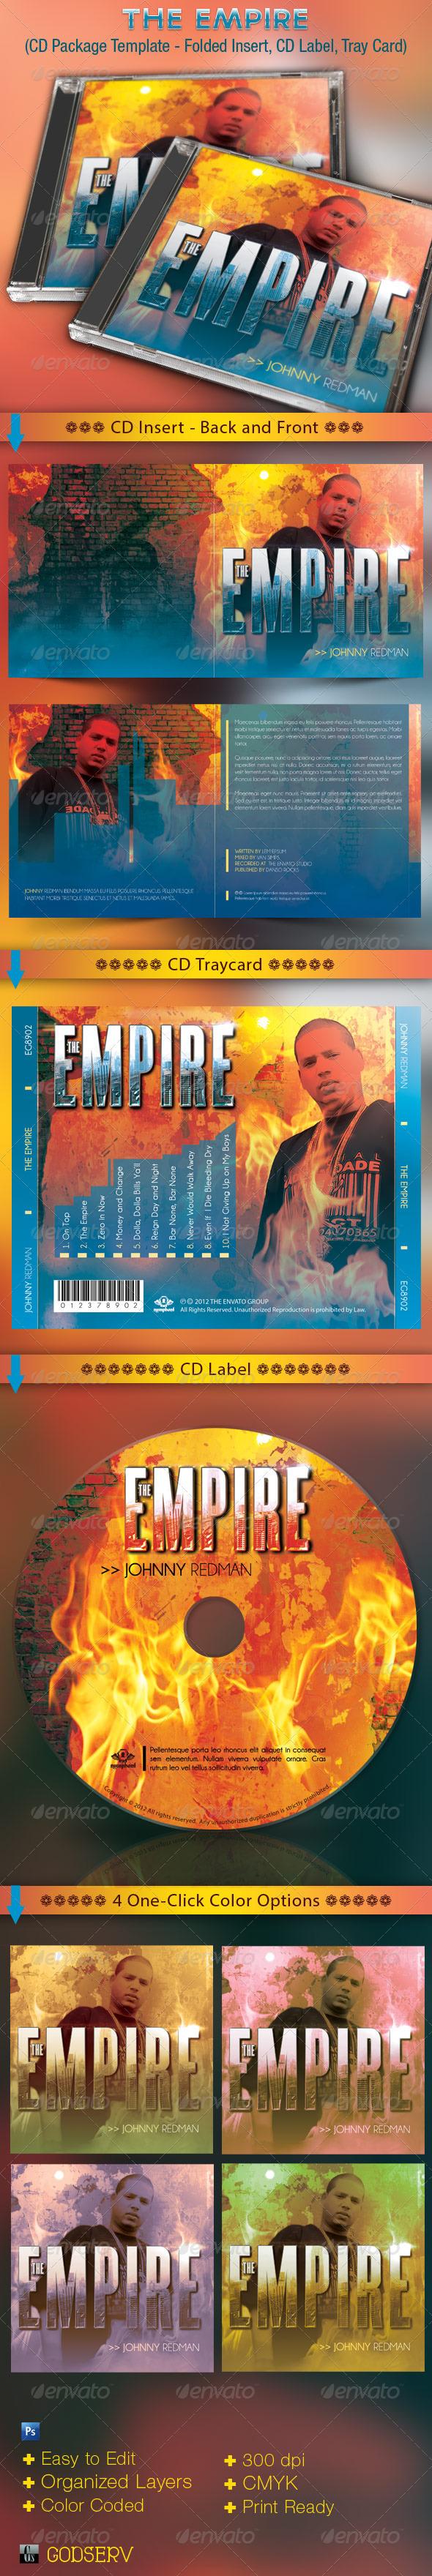 Empire CD Cover Artwork Template - CD & DVD Artwork Print Templates